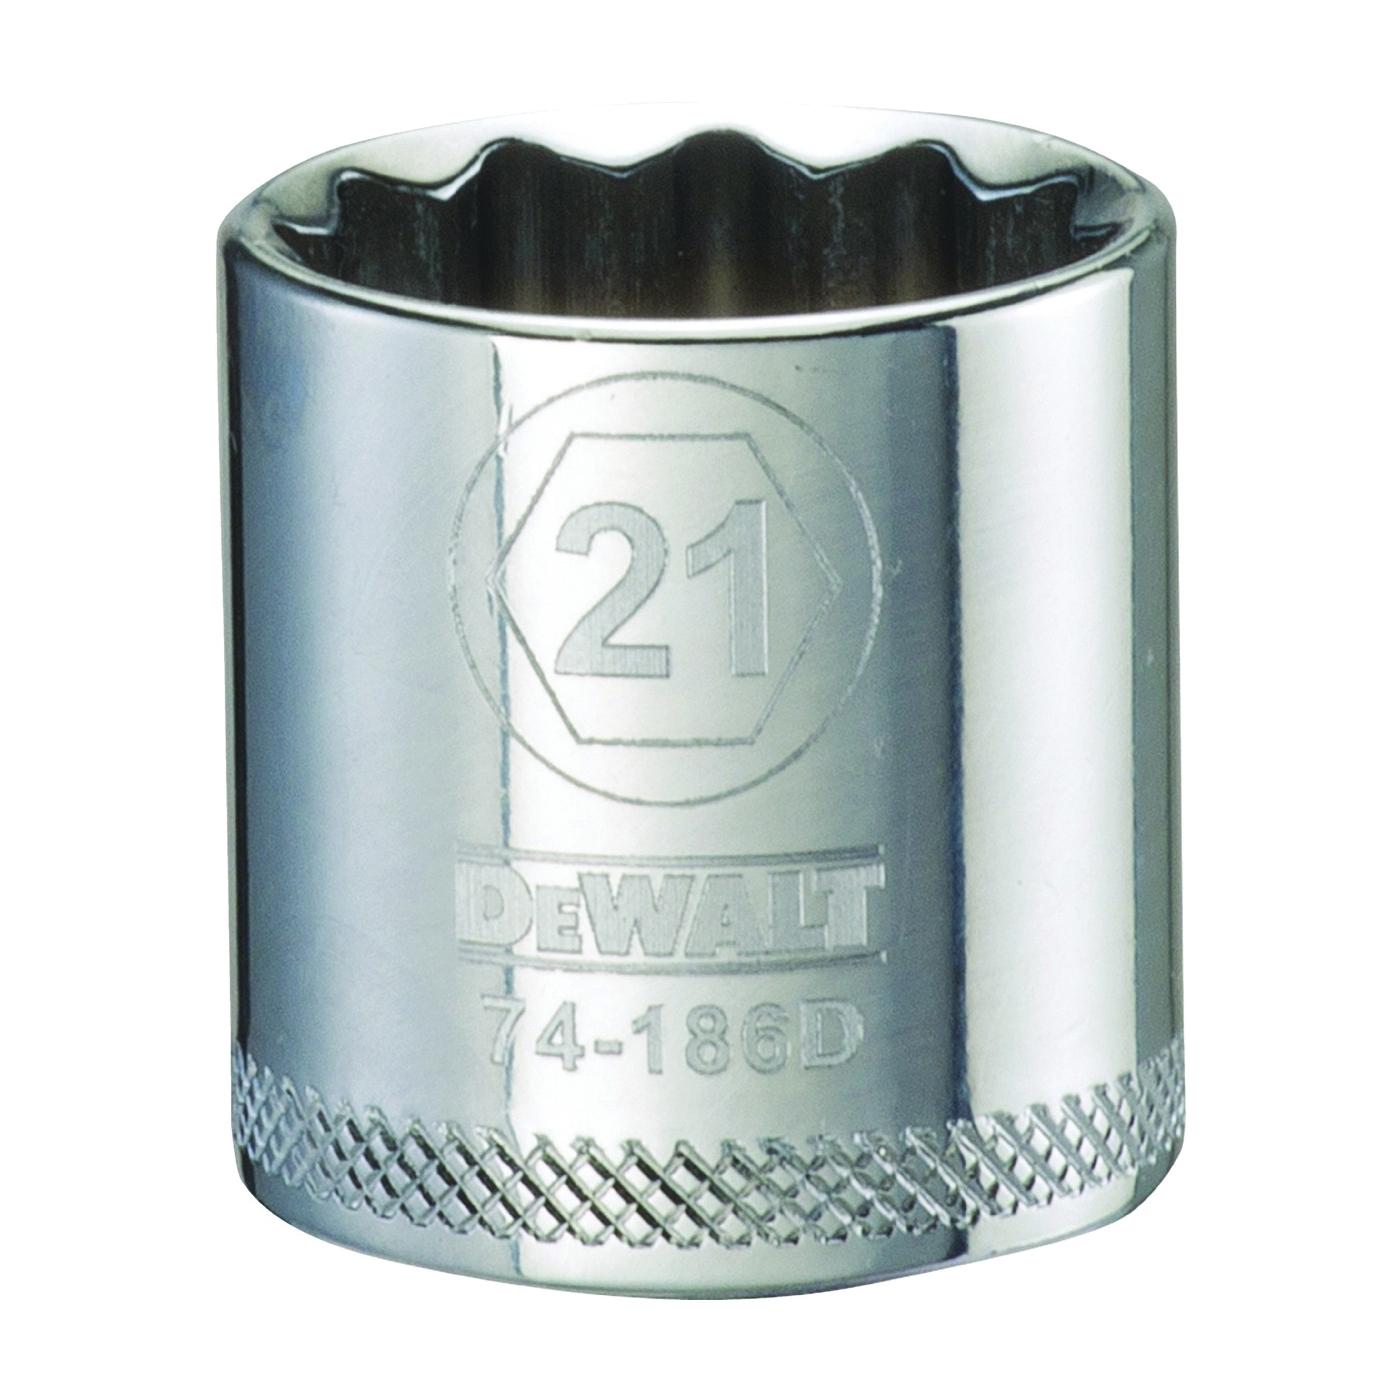 Picture of DeWALT DWMT74186OSP Hand Socket, 21 mm Socket, 3/8 in Drive, 12 -Point, Vanadium Steel, Polished Chrome